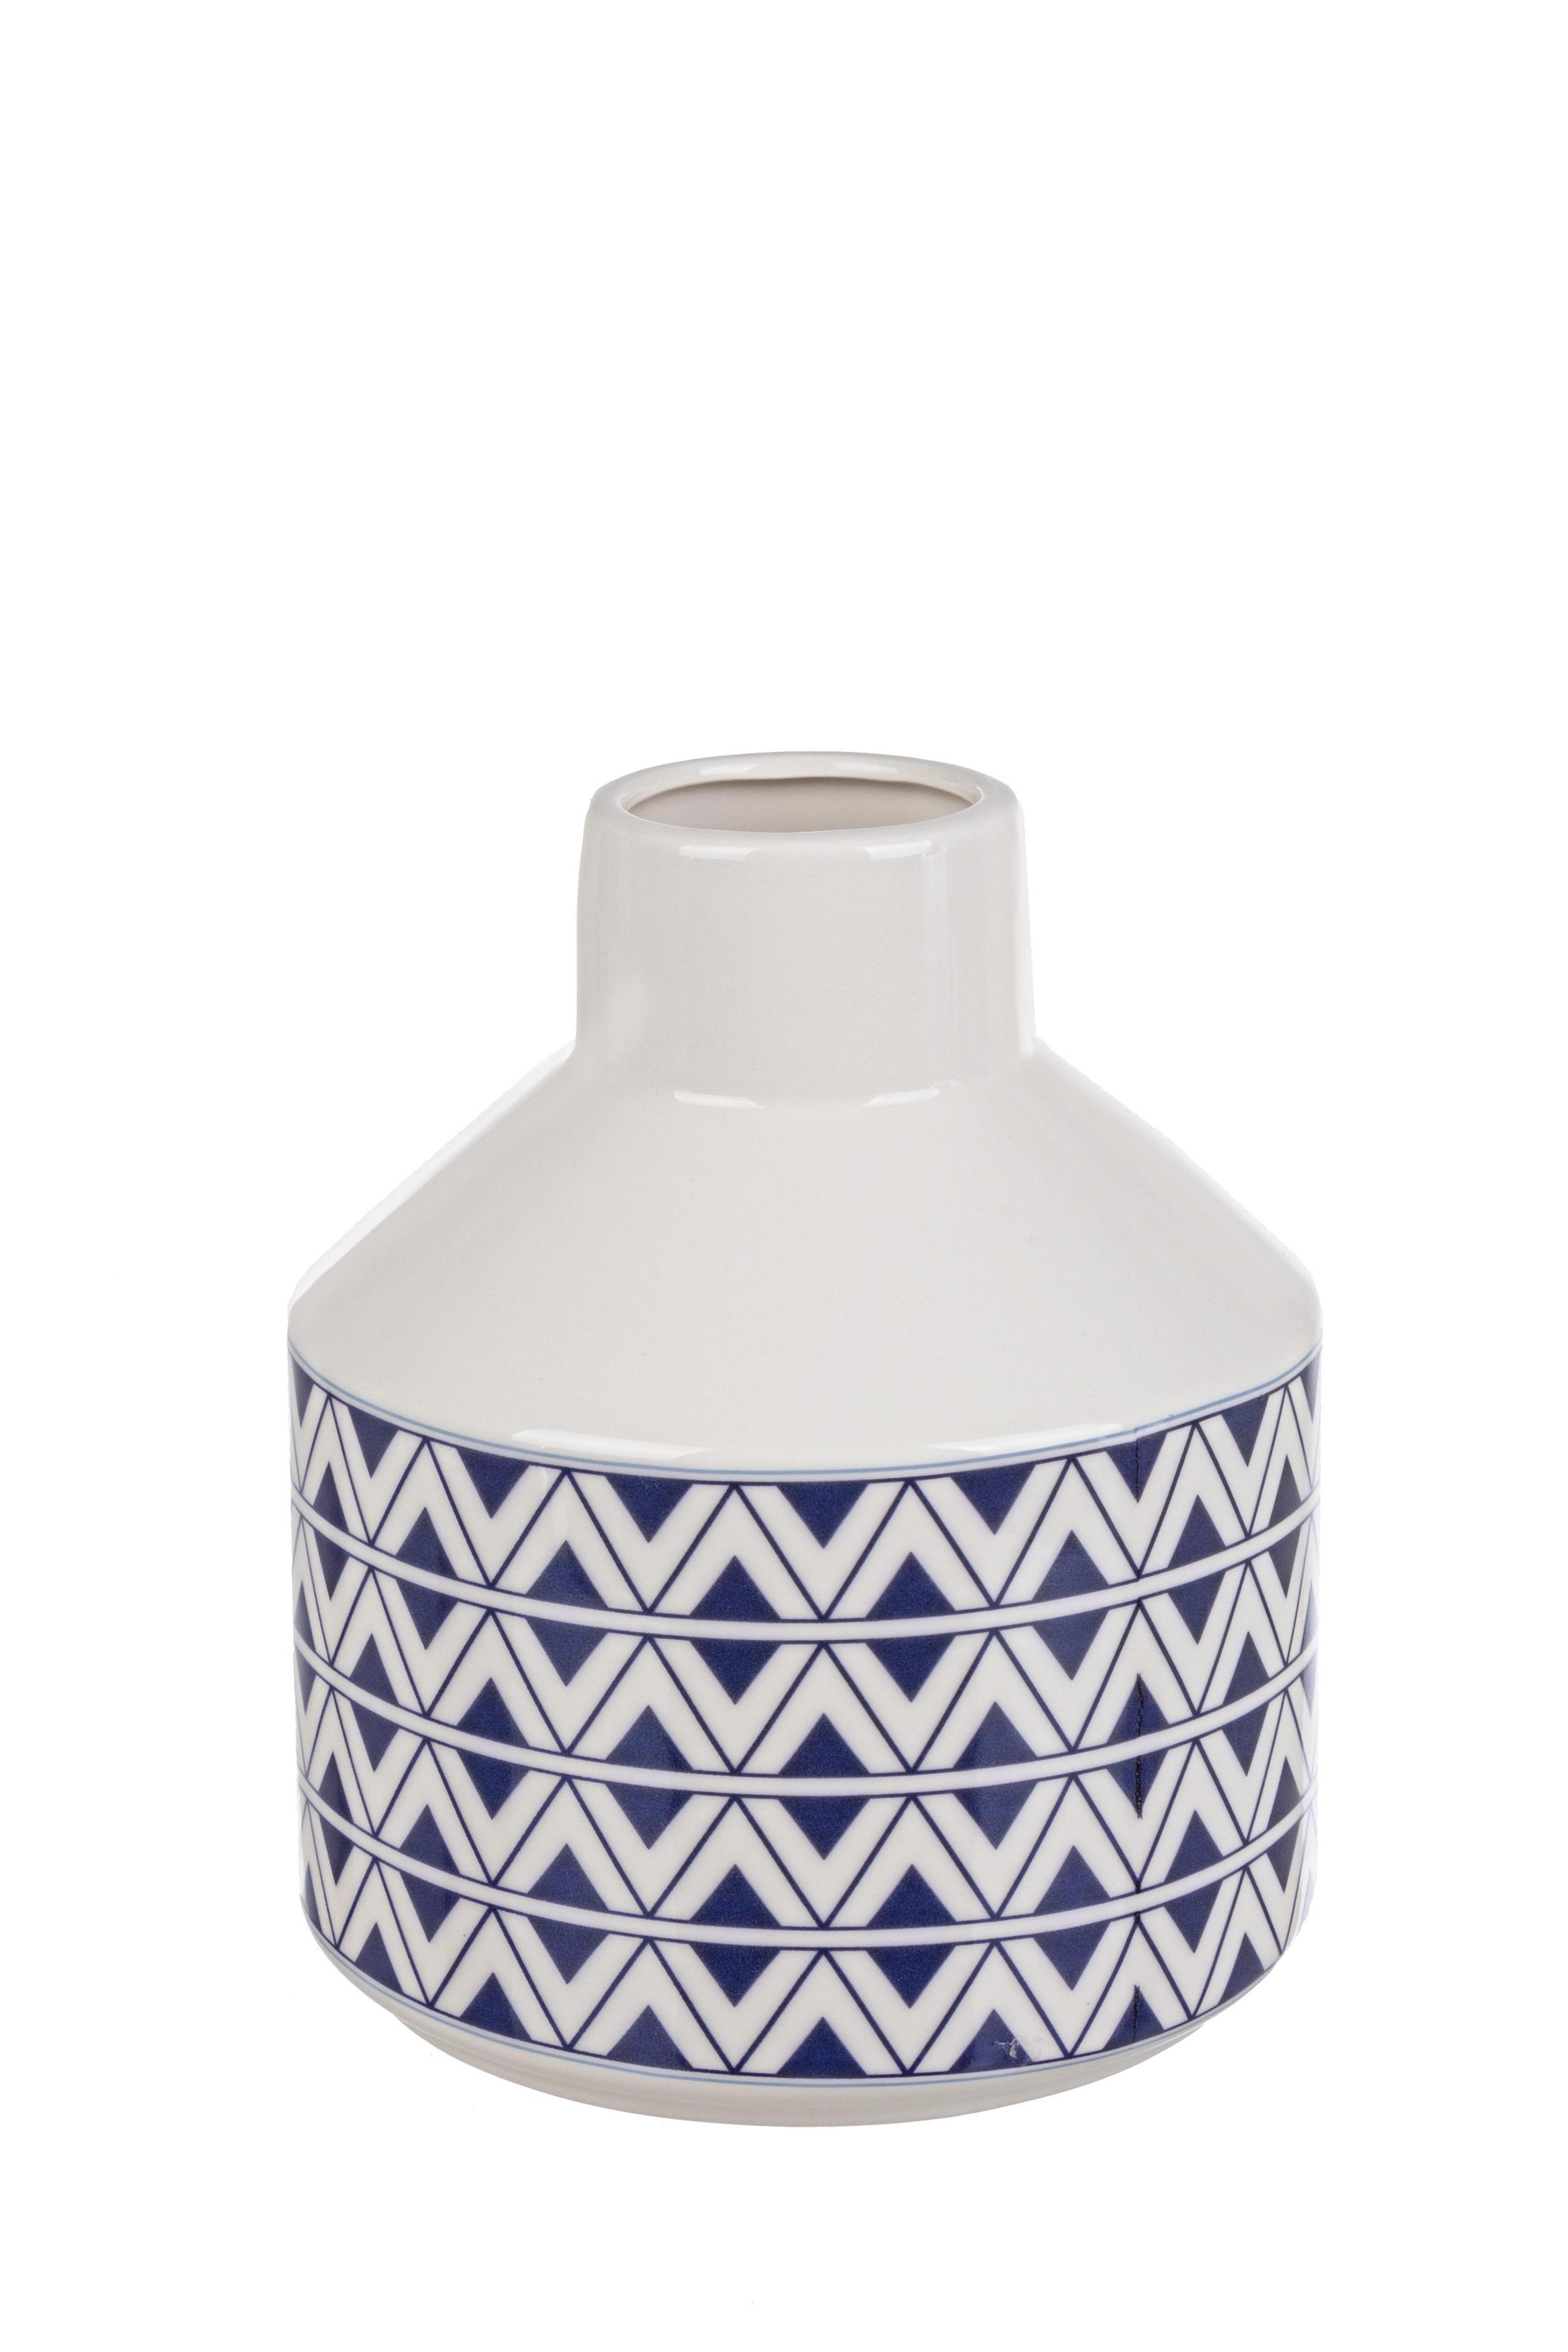 Vaza decorativa din ceramica Tunisi S Alb / Albastru, Ø17xH19,5 cm poza